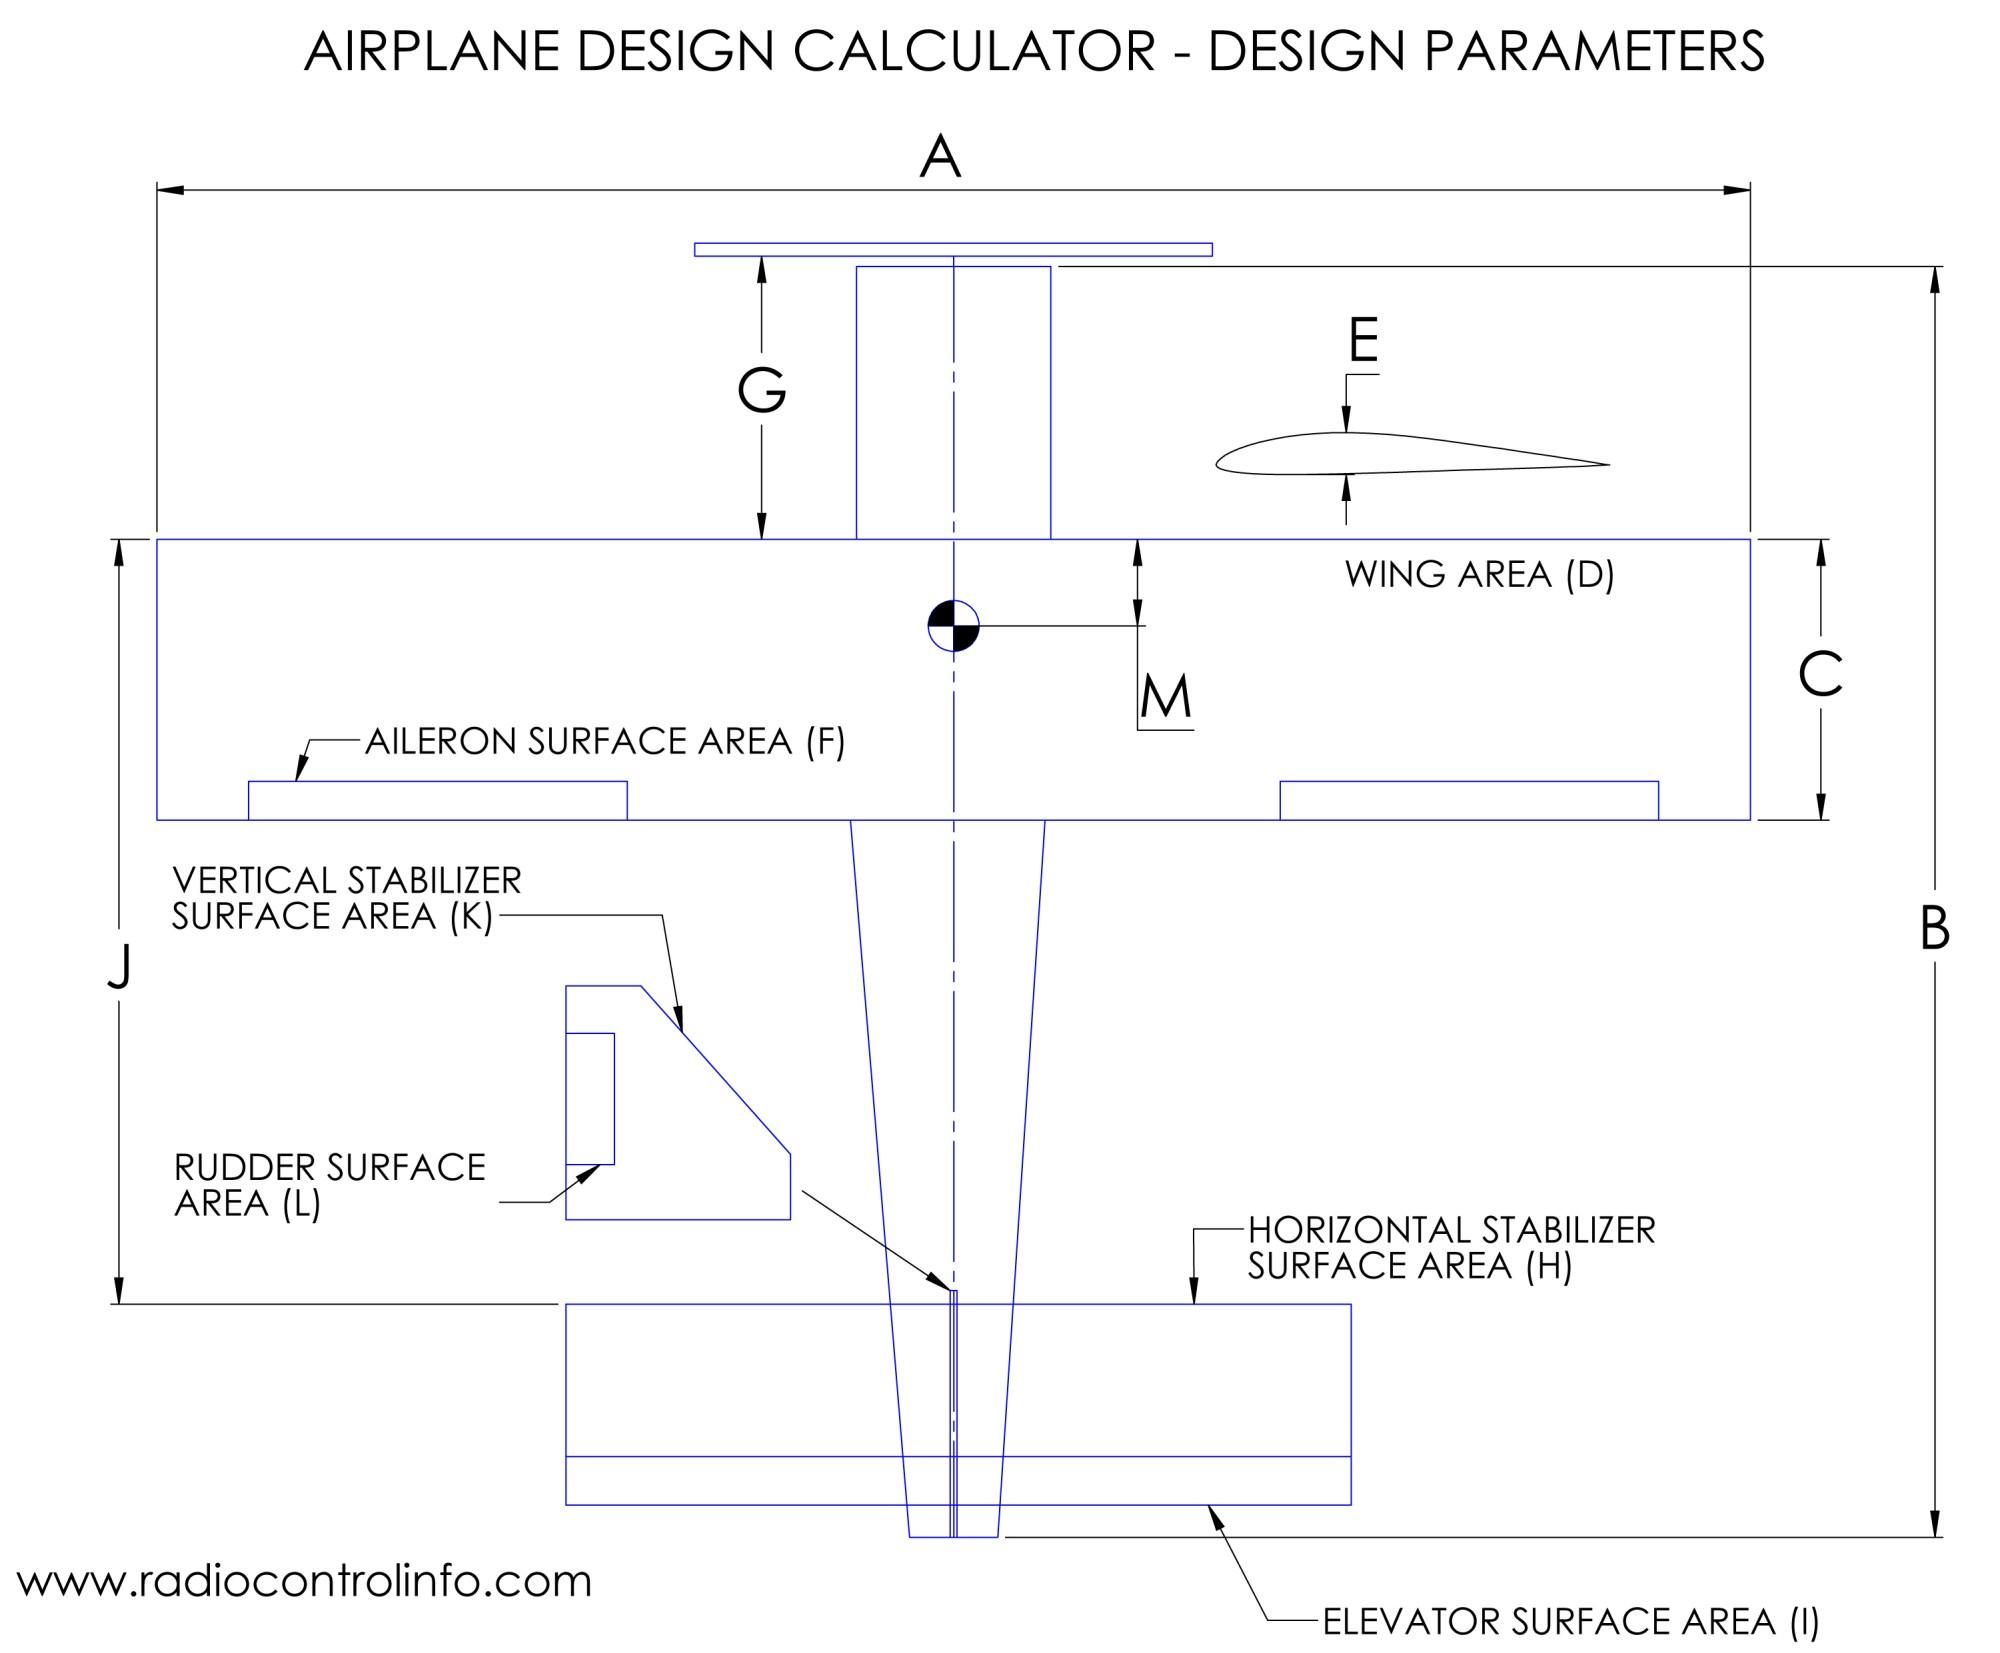 hight resolution of airplane design calculator